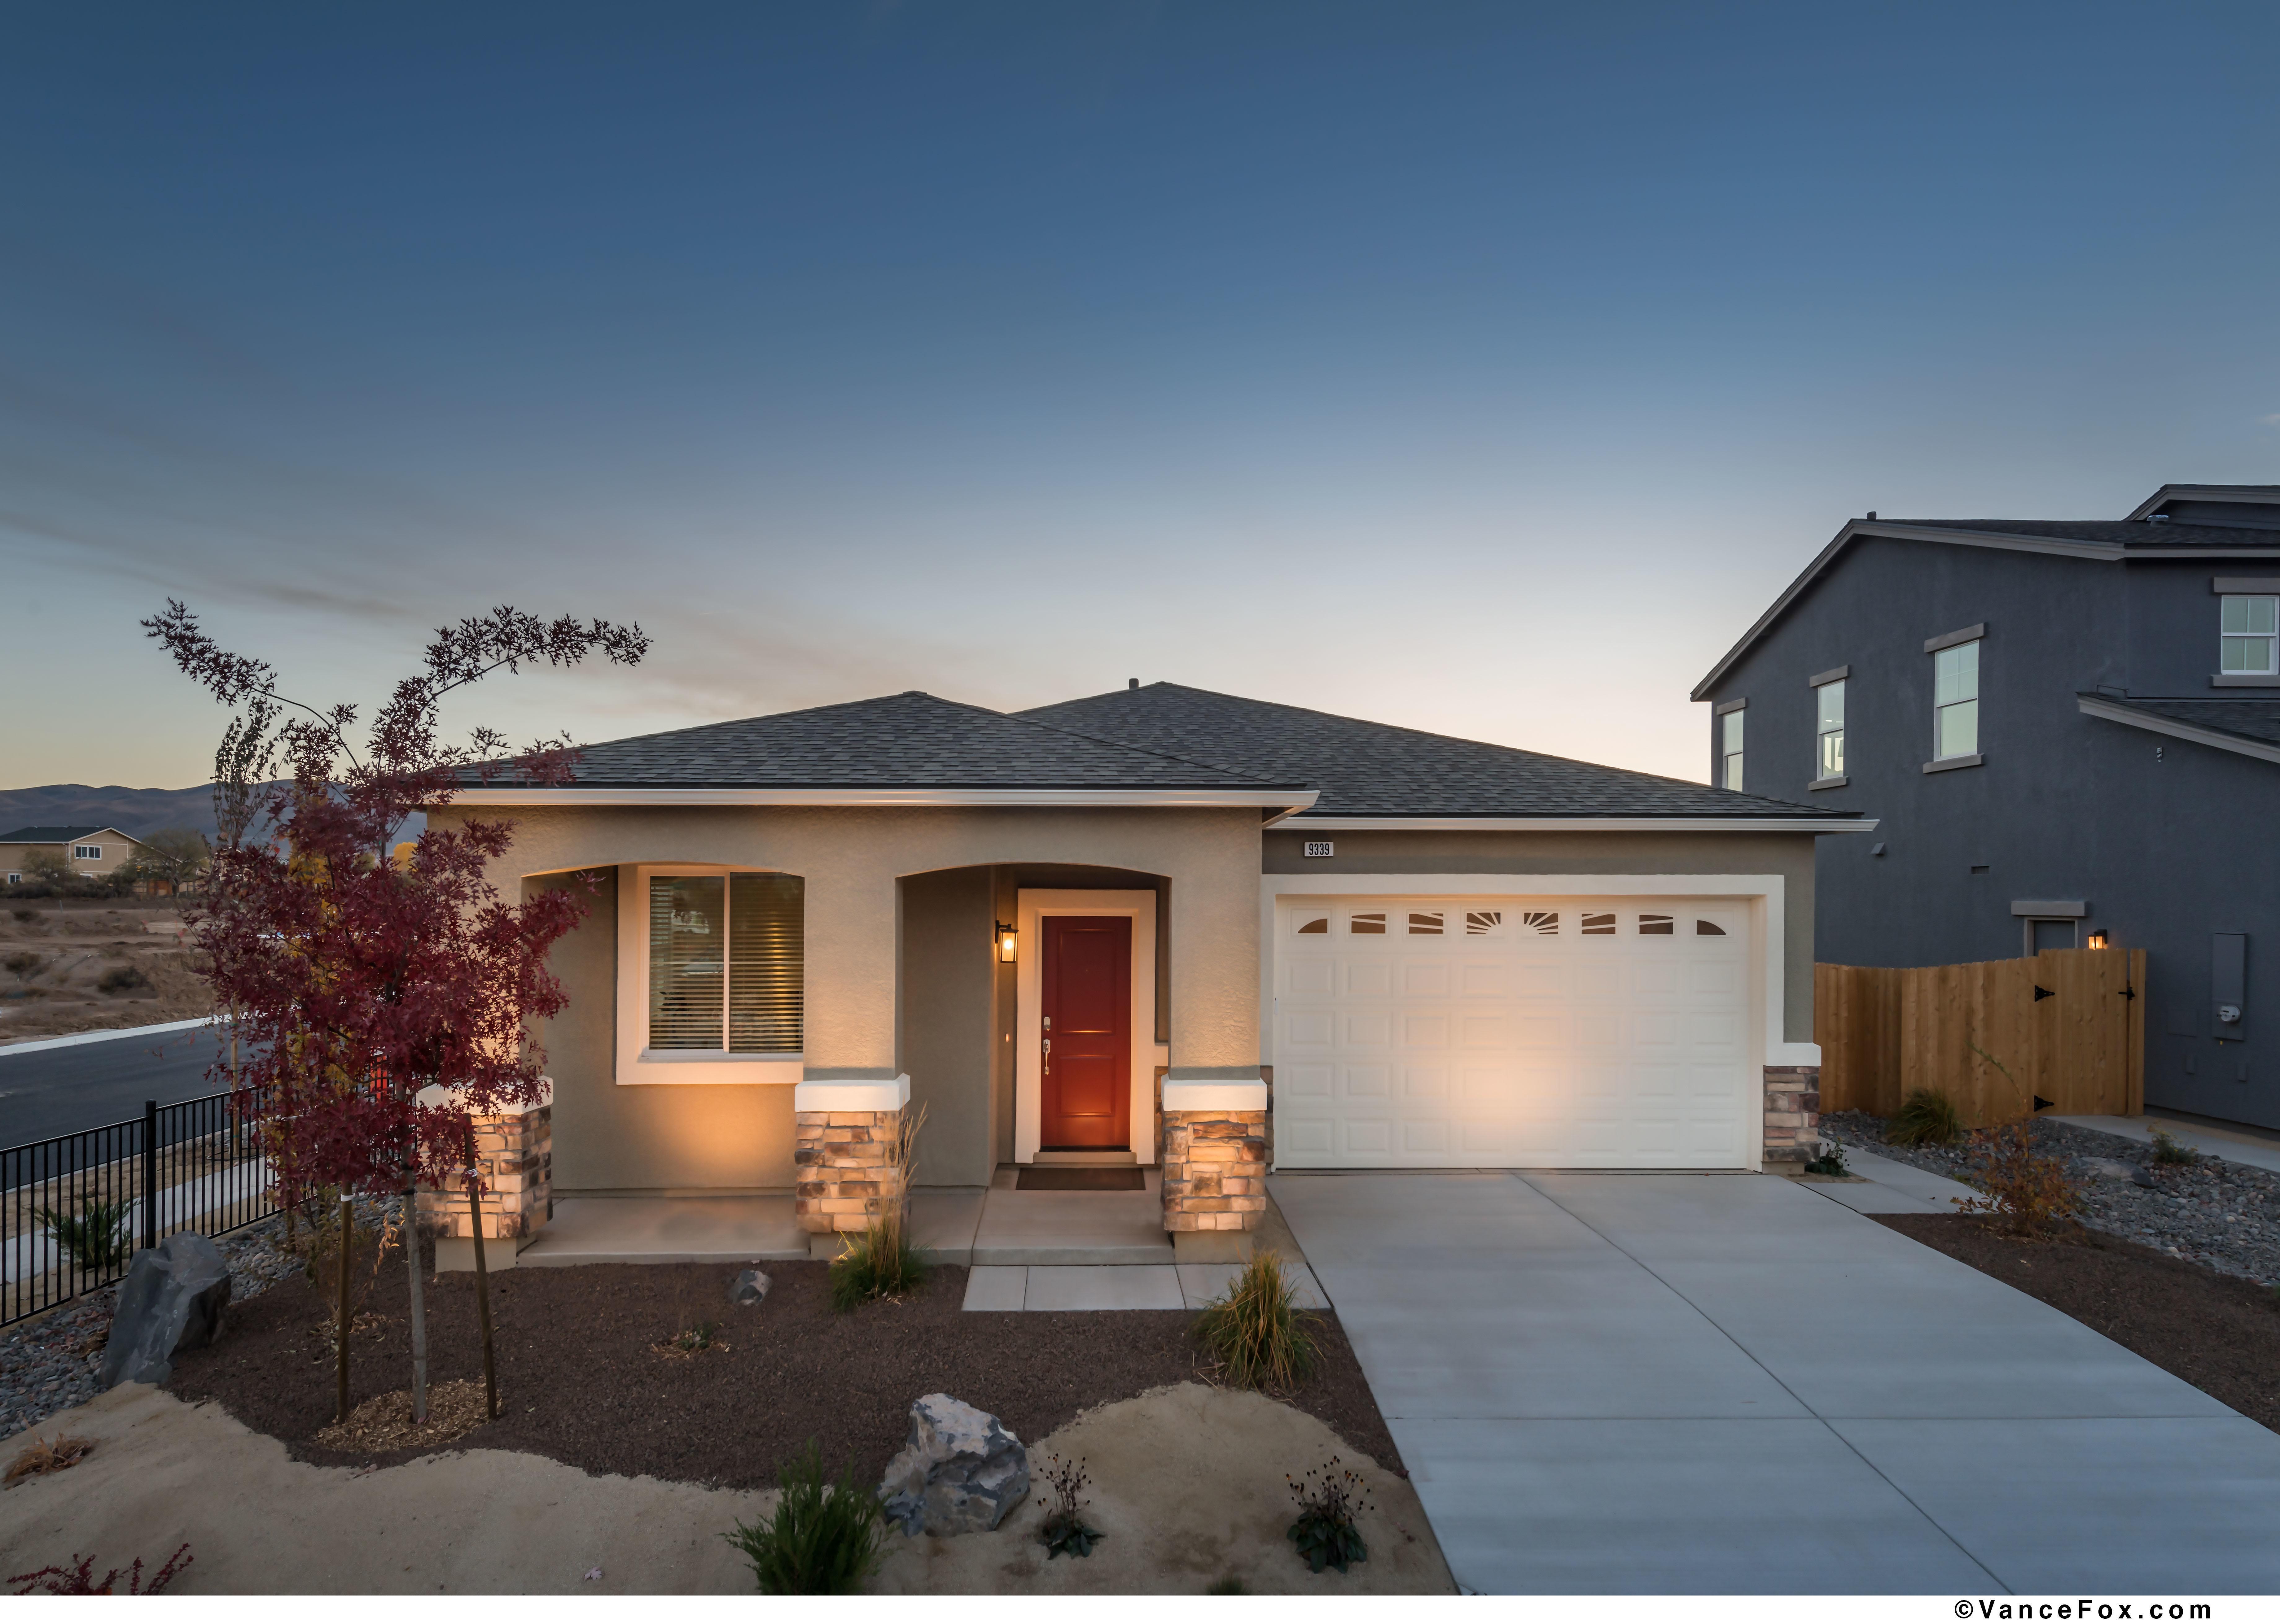 Fabulous New Homes In Reno 119 Communities Newhomesource Download Free Architecture Designs Intelgarnamadebymaigaardcom